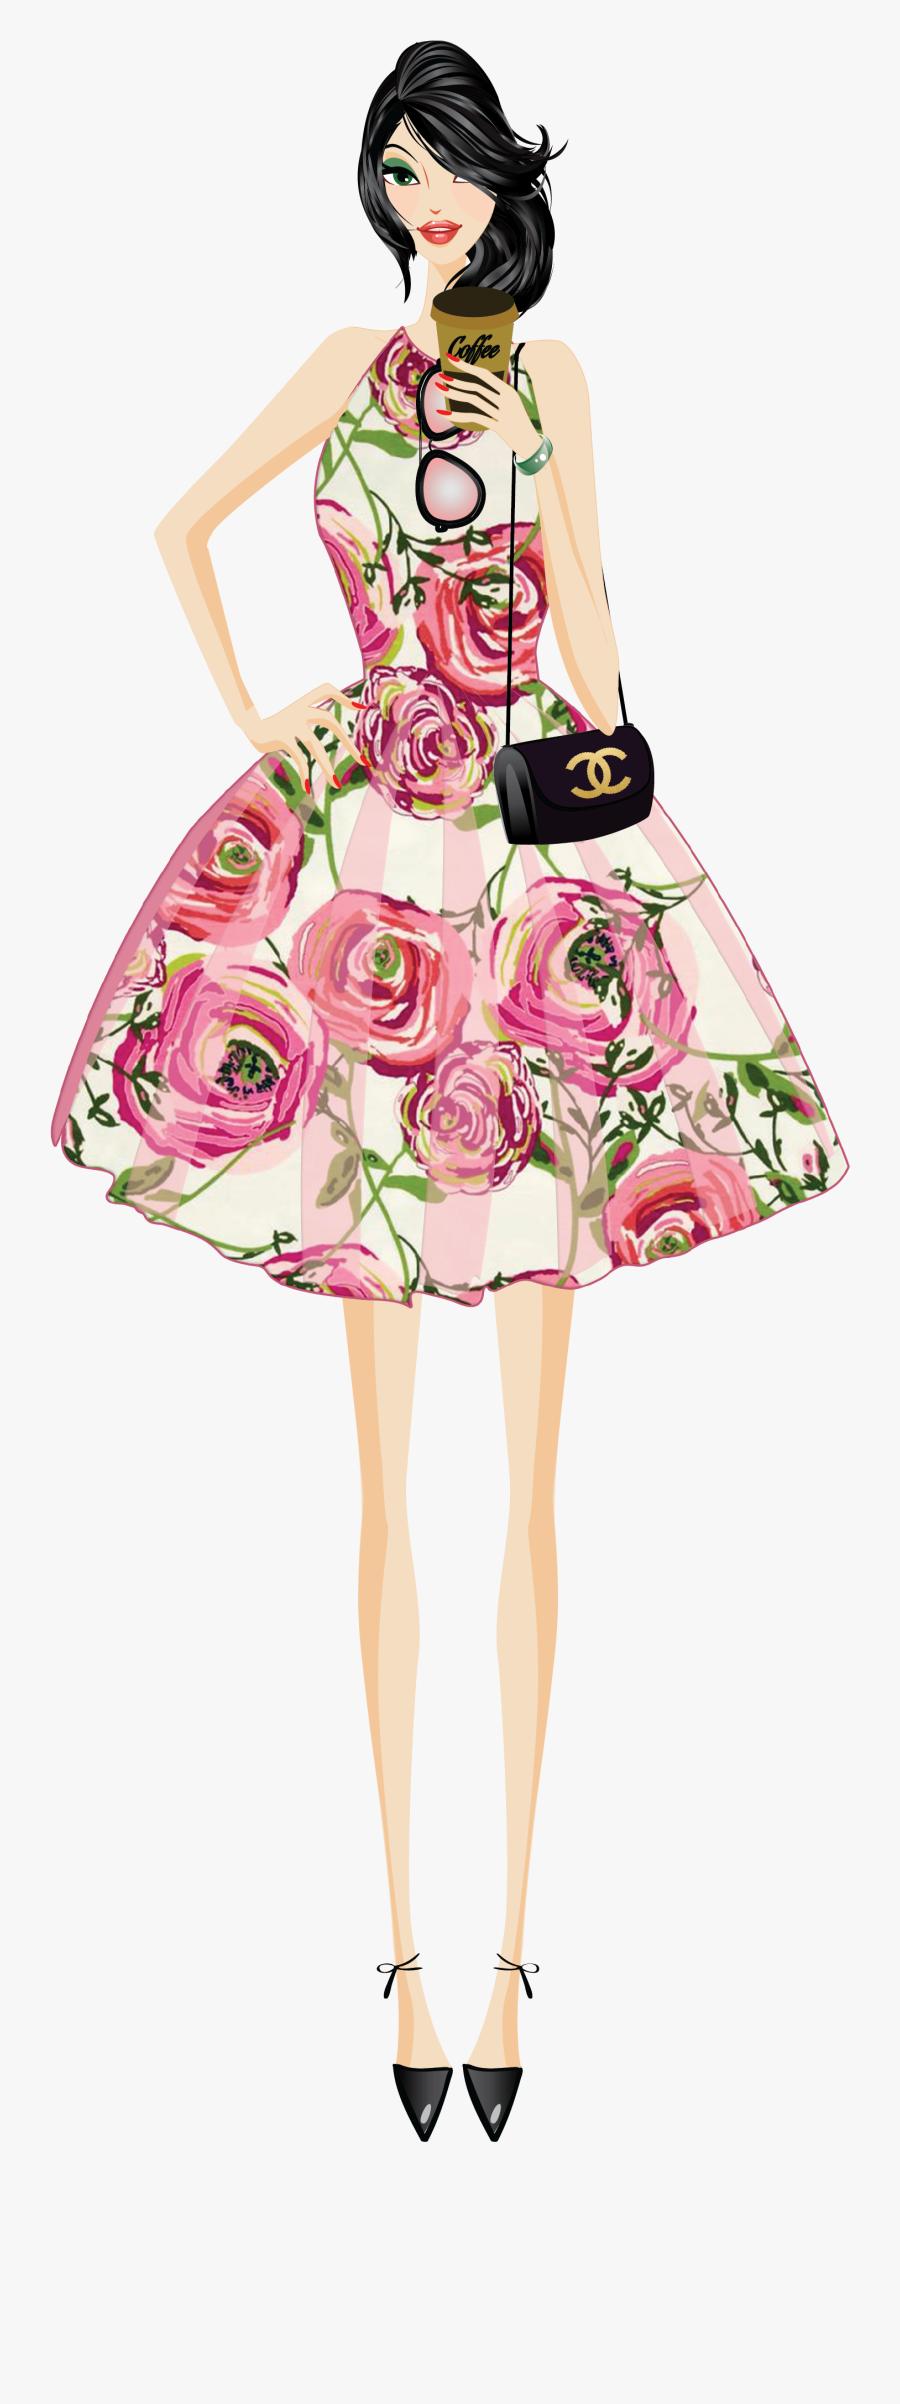 Fashion Clipart Mini Dress - Fashion Girl Vector Png, Transparent Clipart